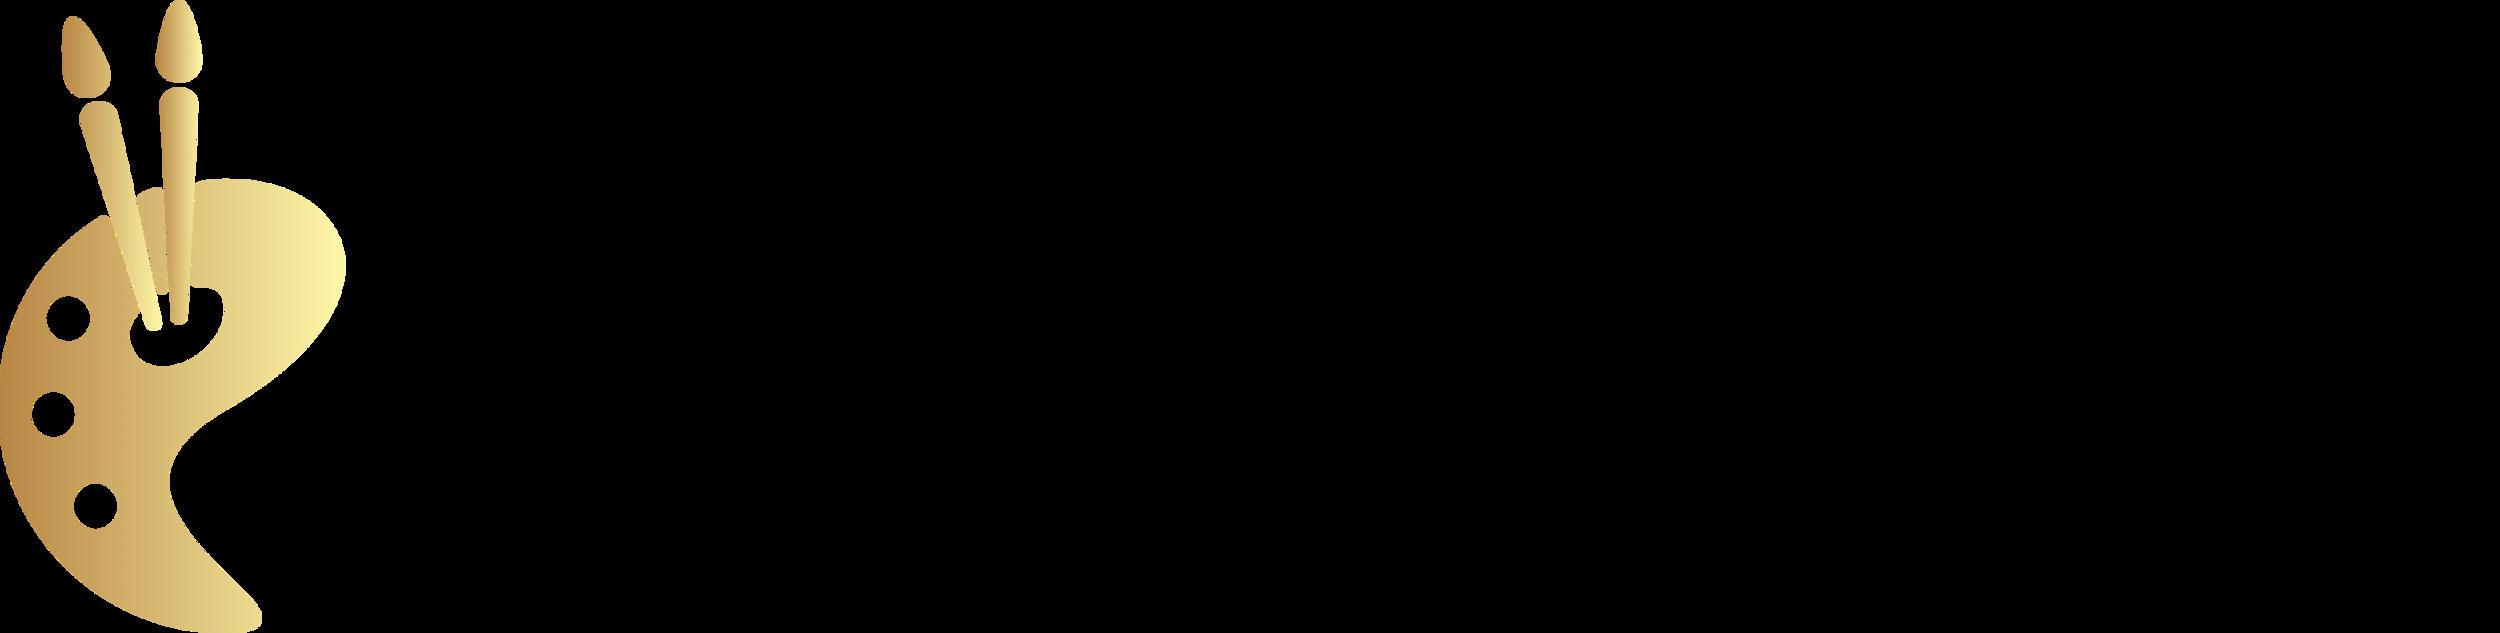 Black logo - 2.png